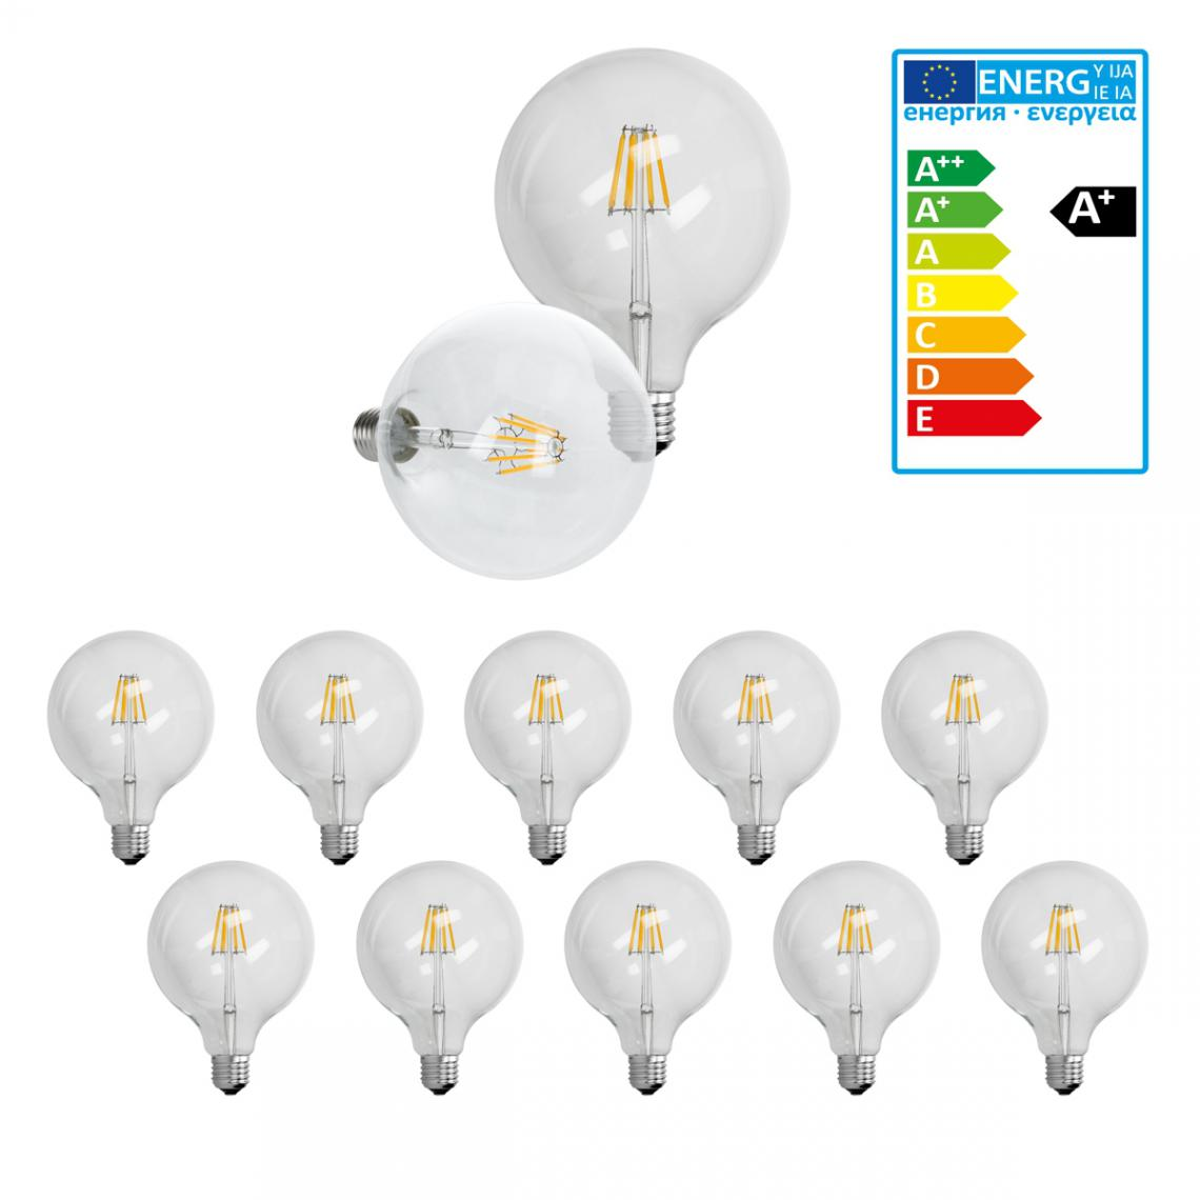 Ecd Germany ECD Germany 10 x LED Filament de l'ampoule E27 Edison 6W 125 mm 624 Lumen 120 ° Angle de courant alternatif 220-240 V re